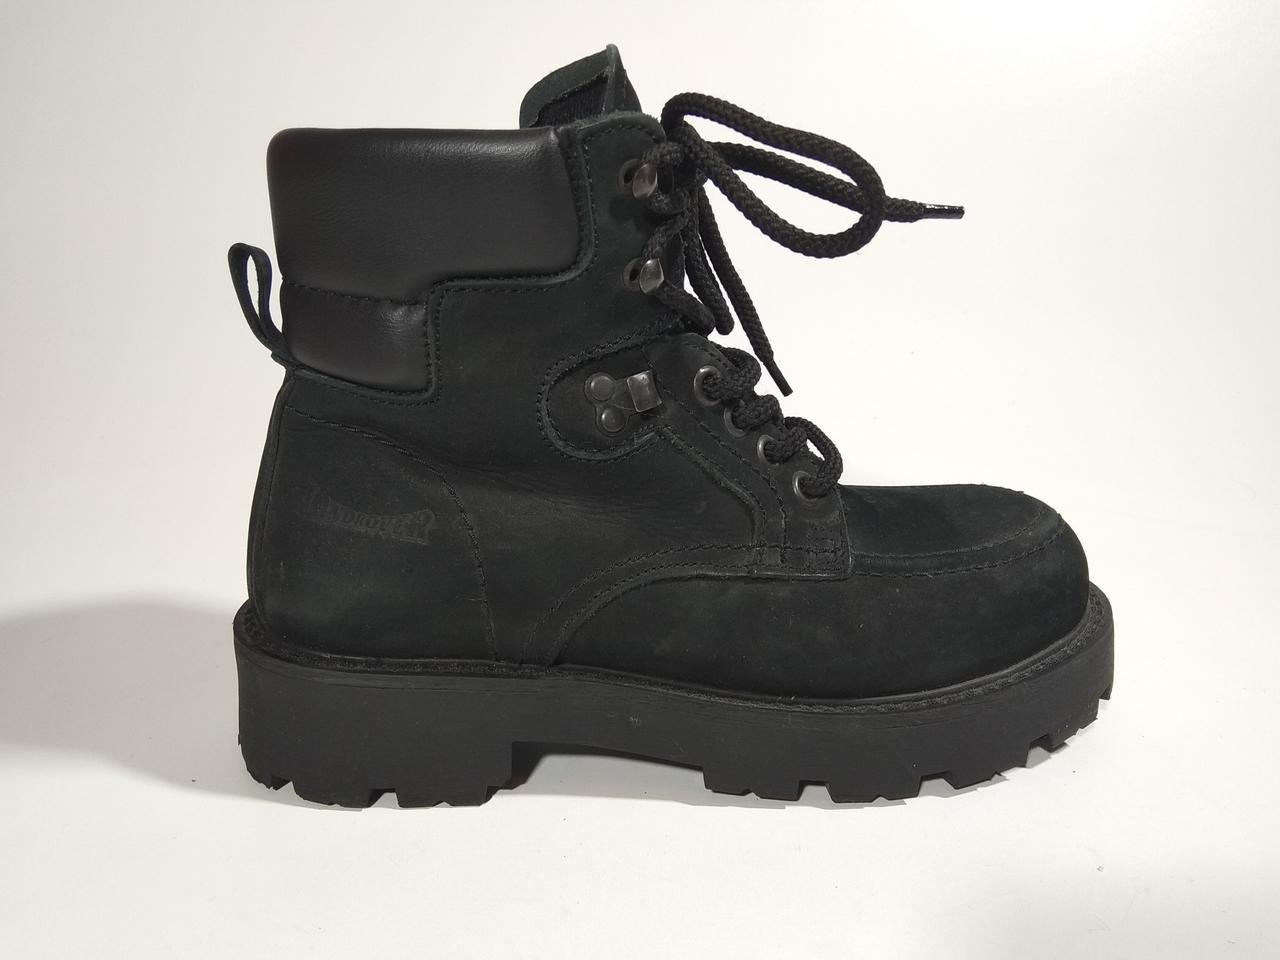 Ботинки бренд Landrover (Лондон) размер 41